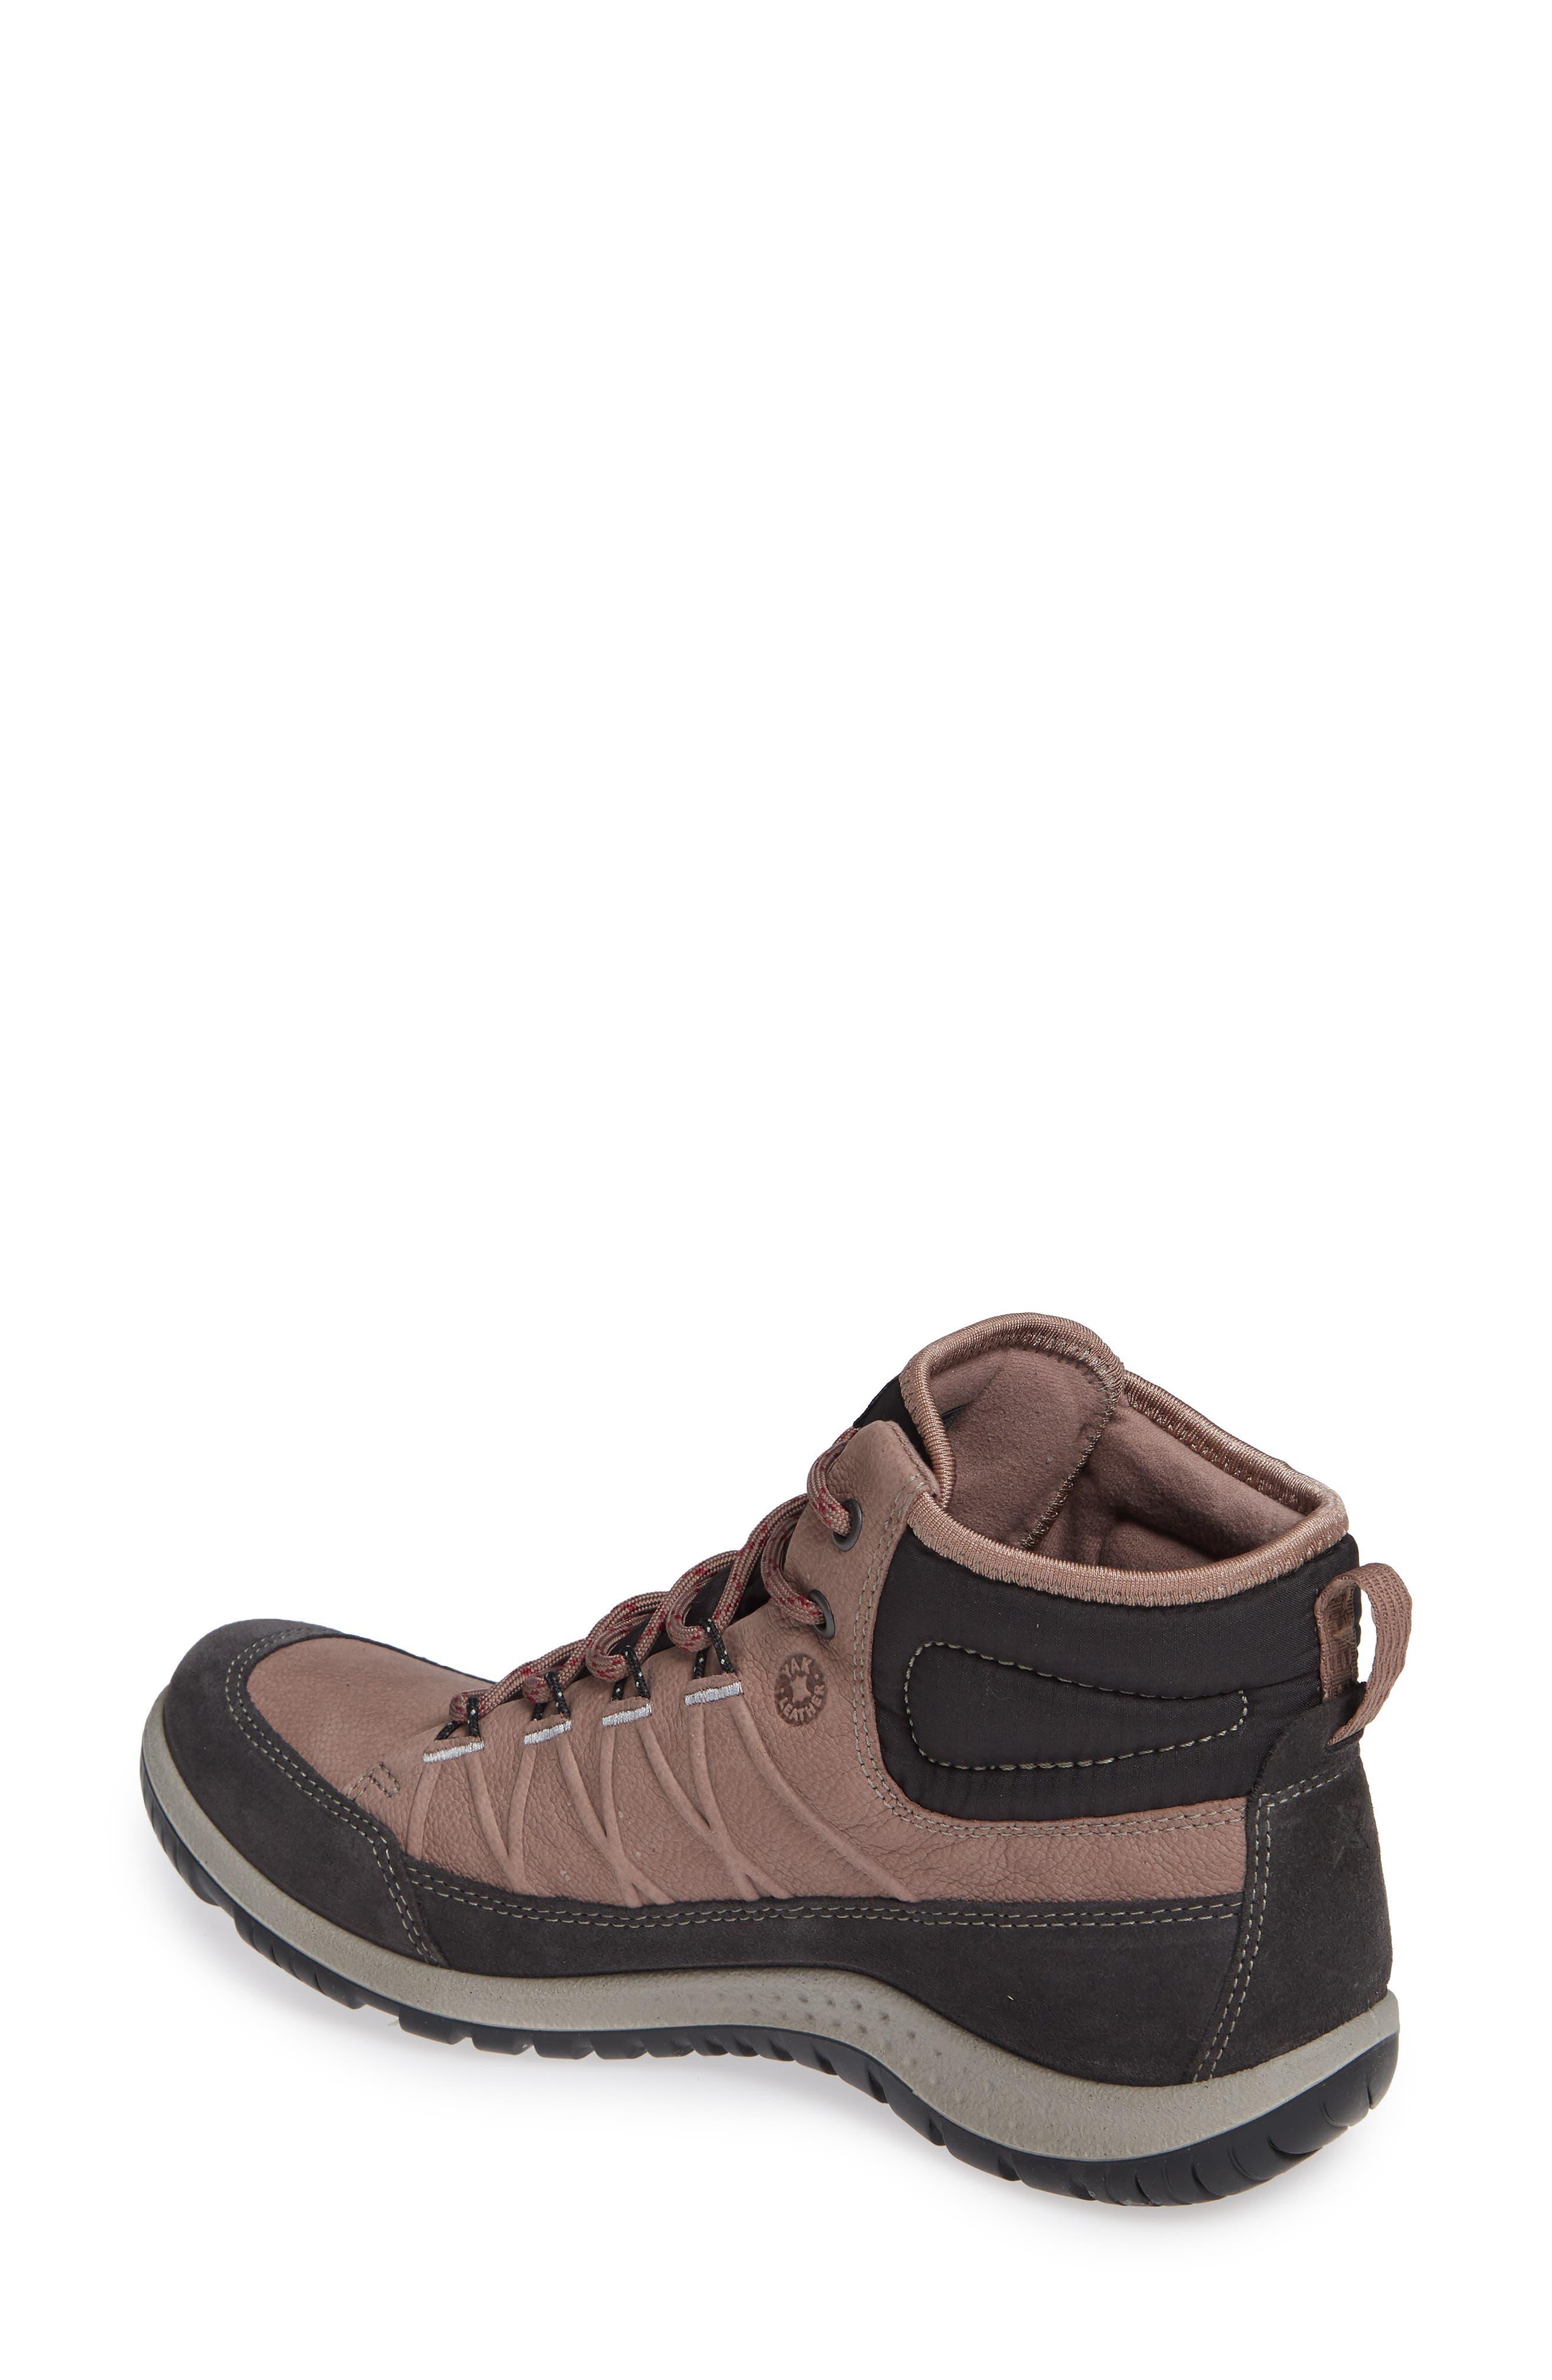 ECCO, 'Aspina GTX' Waterproof High Top Shoe, Alternate thumbnail 2, color, DEEP TAUPE NUBUCK LEATHER